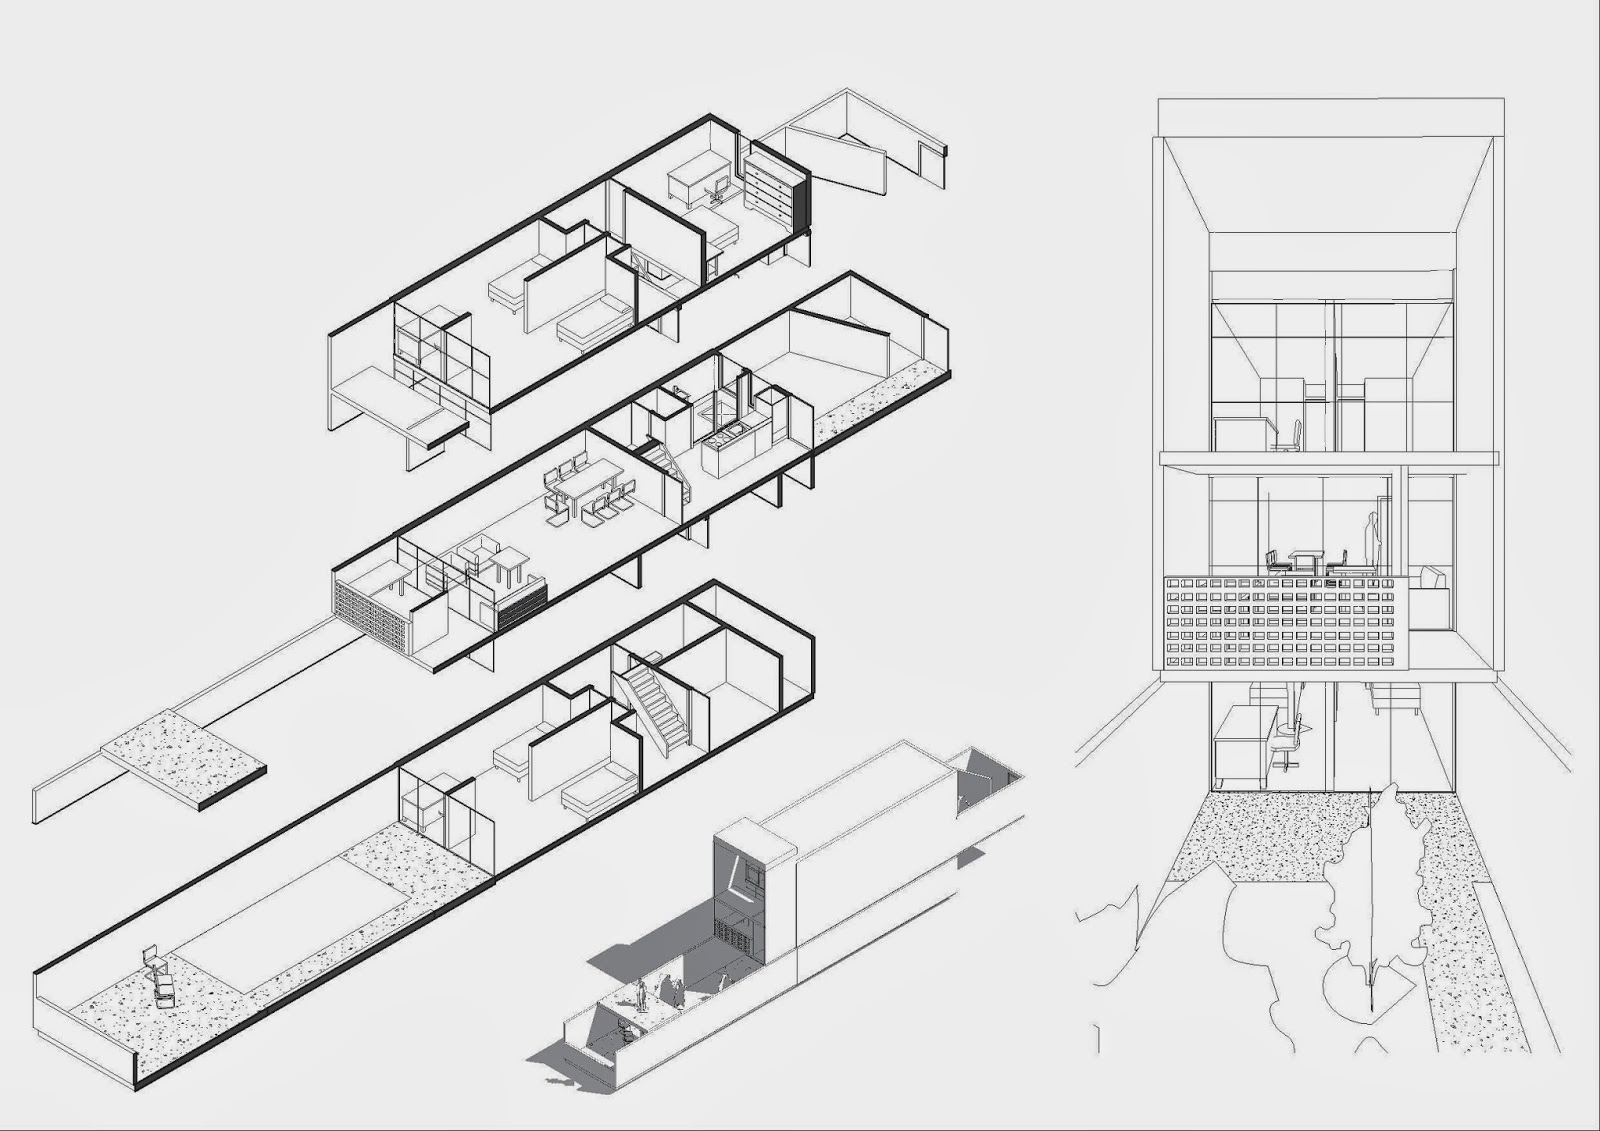 historia de la arquitectura moderna siedlung halen